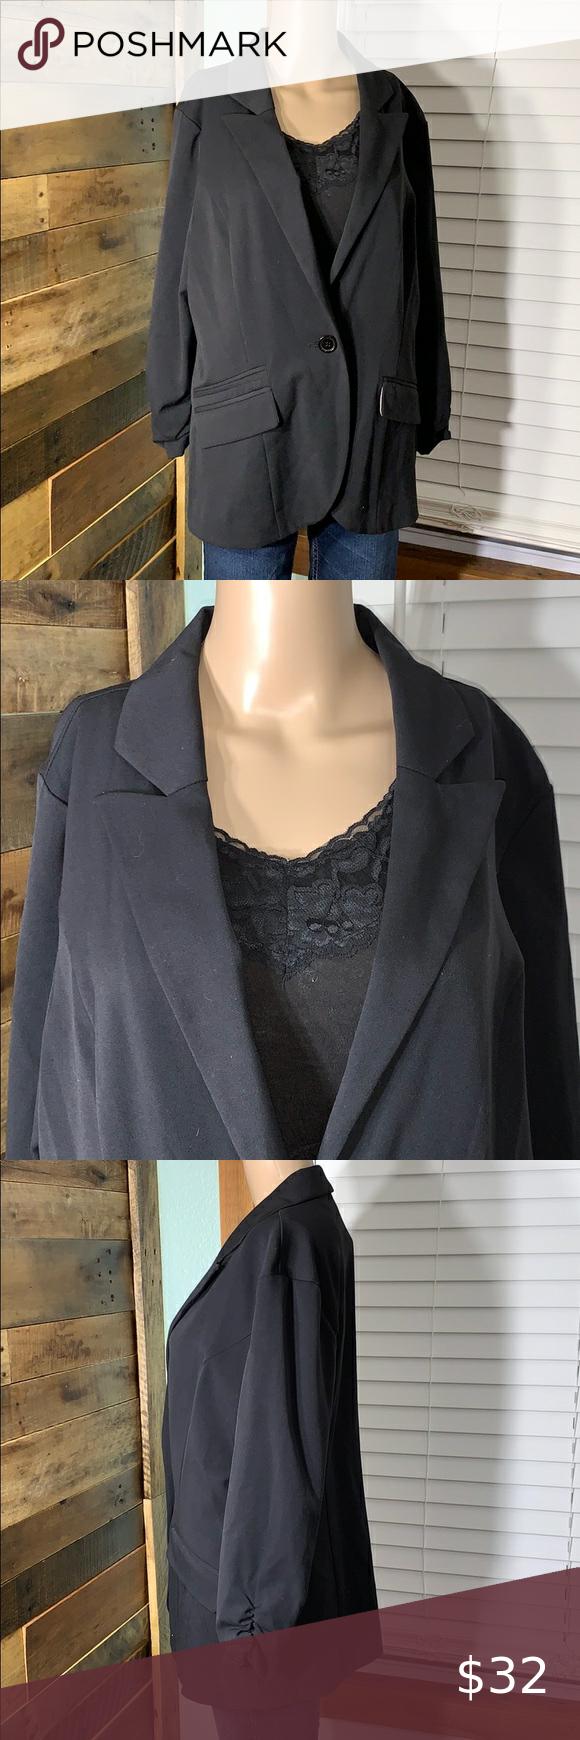 Maurices Black Blazer Suit Jacket Euc Xl In 2021 Black Dress Jacket Black Jacket Blazer Bright Blazer [ 1740 x 580 Pixel ]